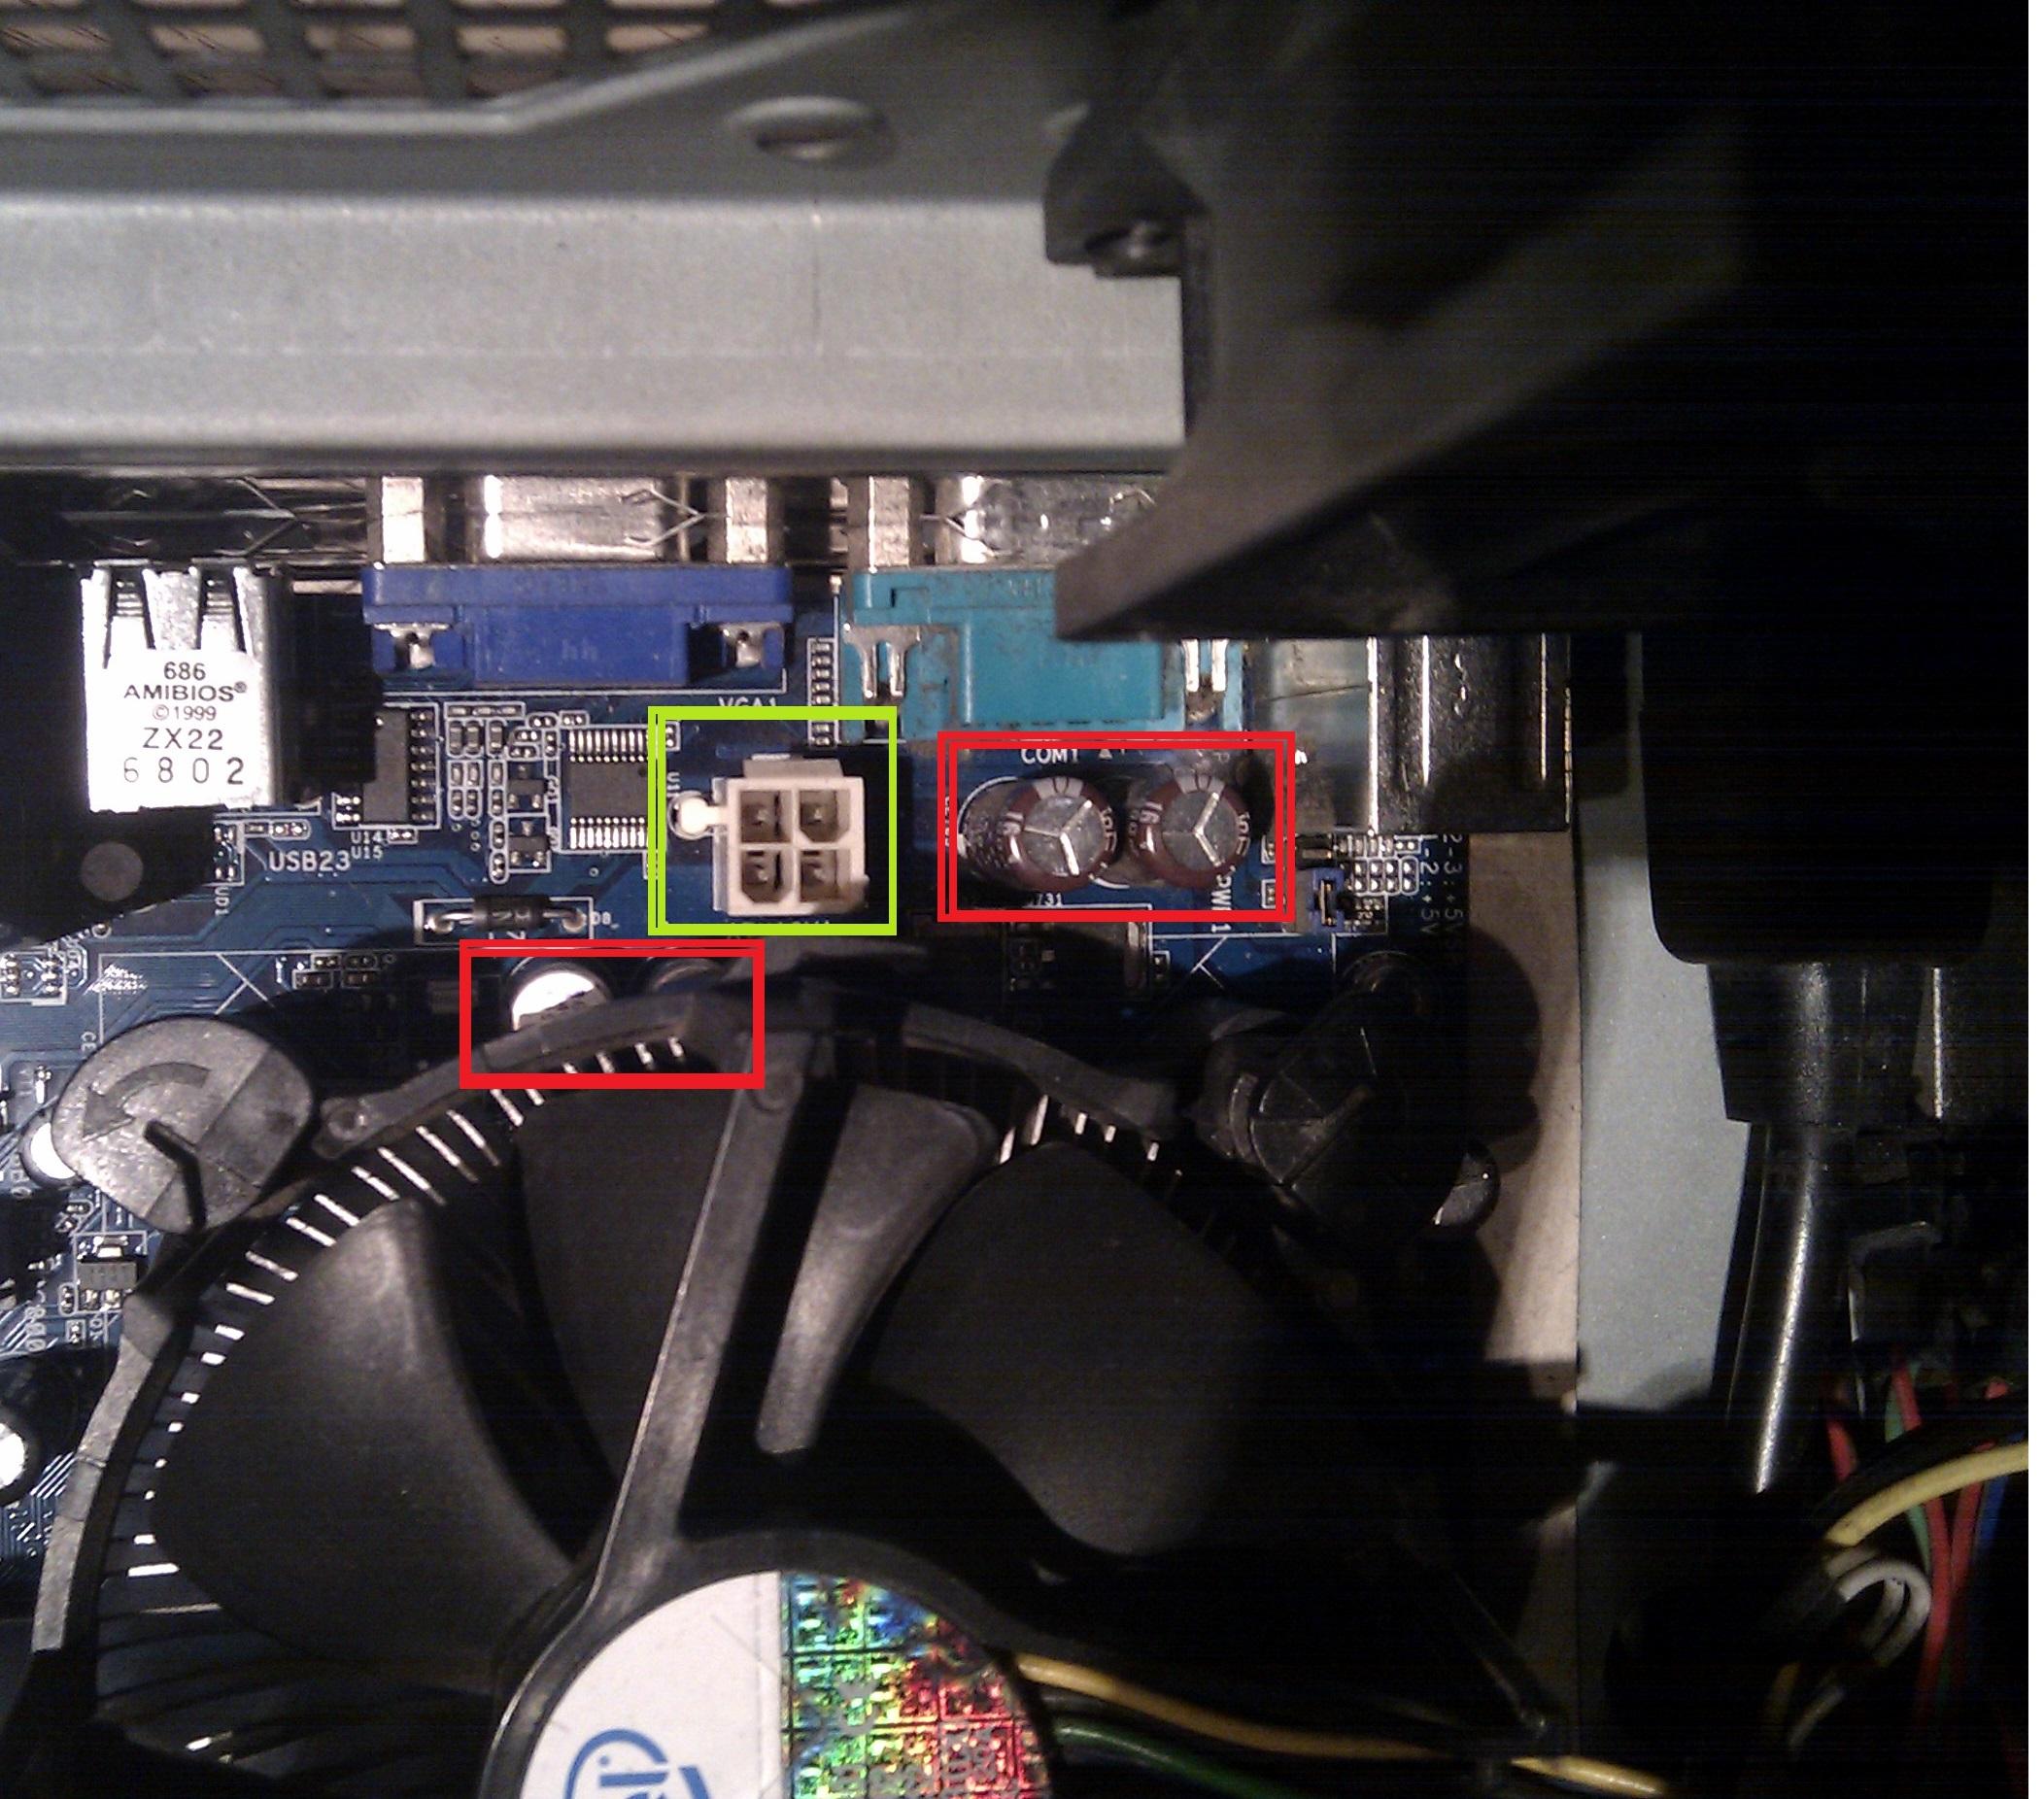 Asrock G31M-S R2.0 - P�yta g��wna nie w��cza si� po pod�aczeniu gniazda 12V ATX